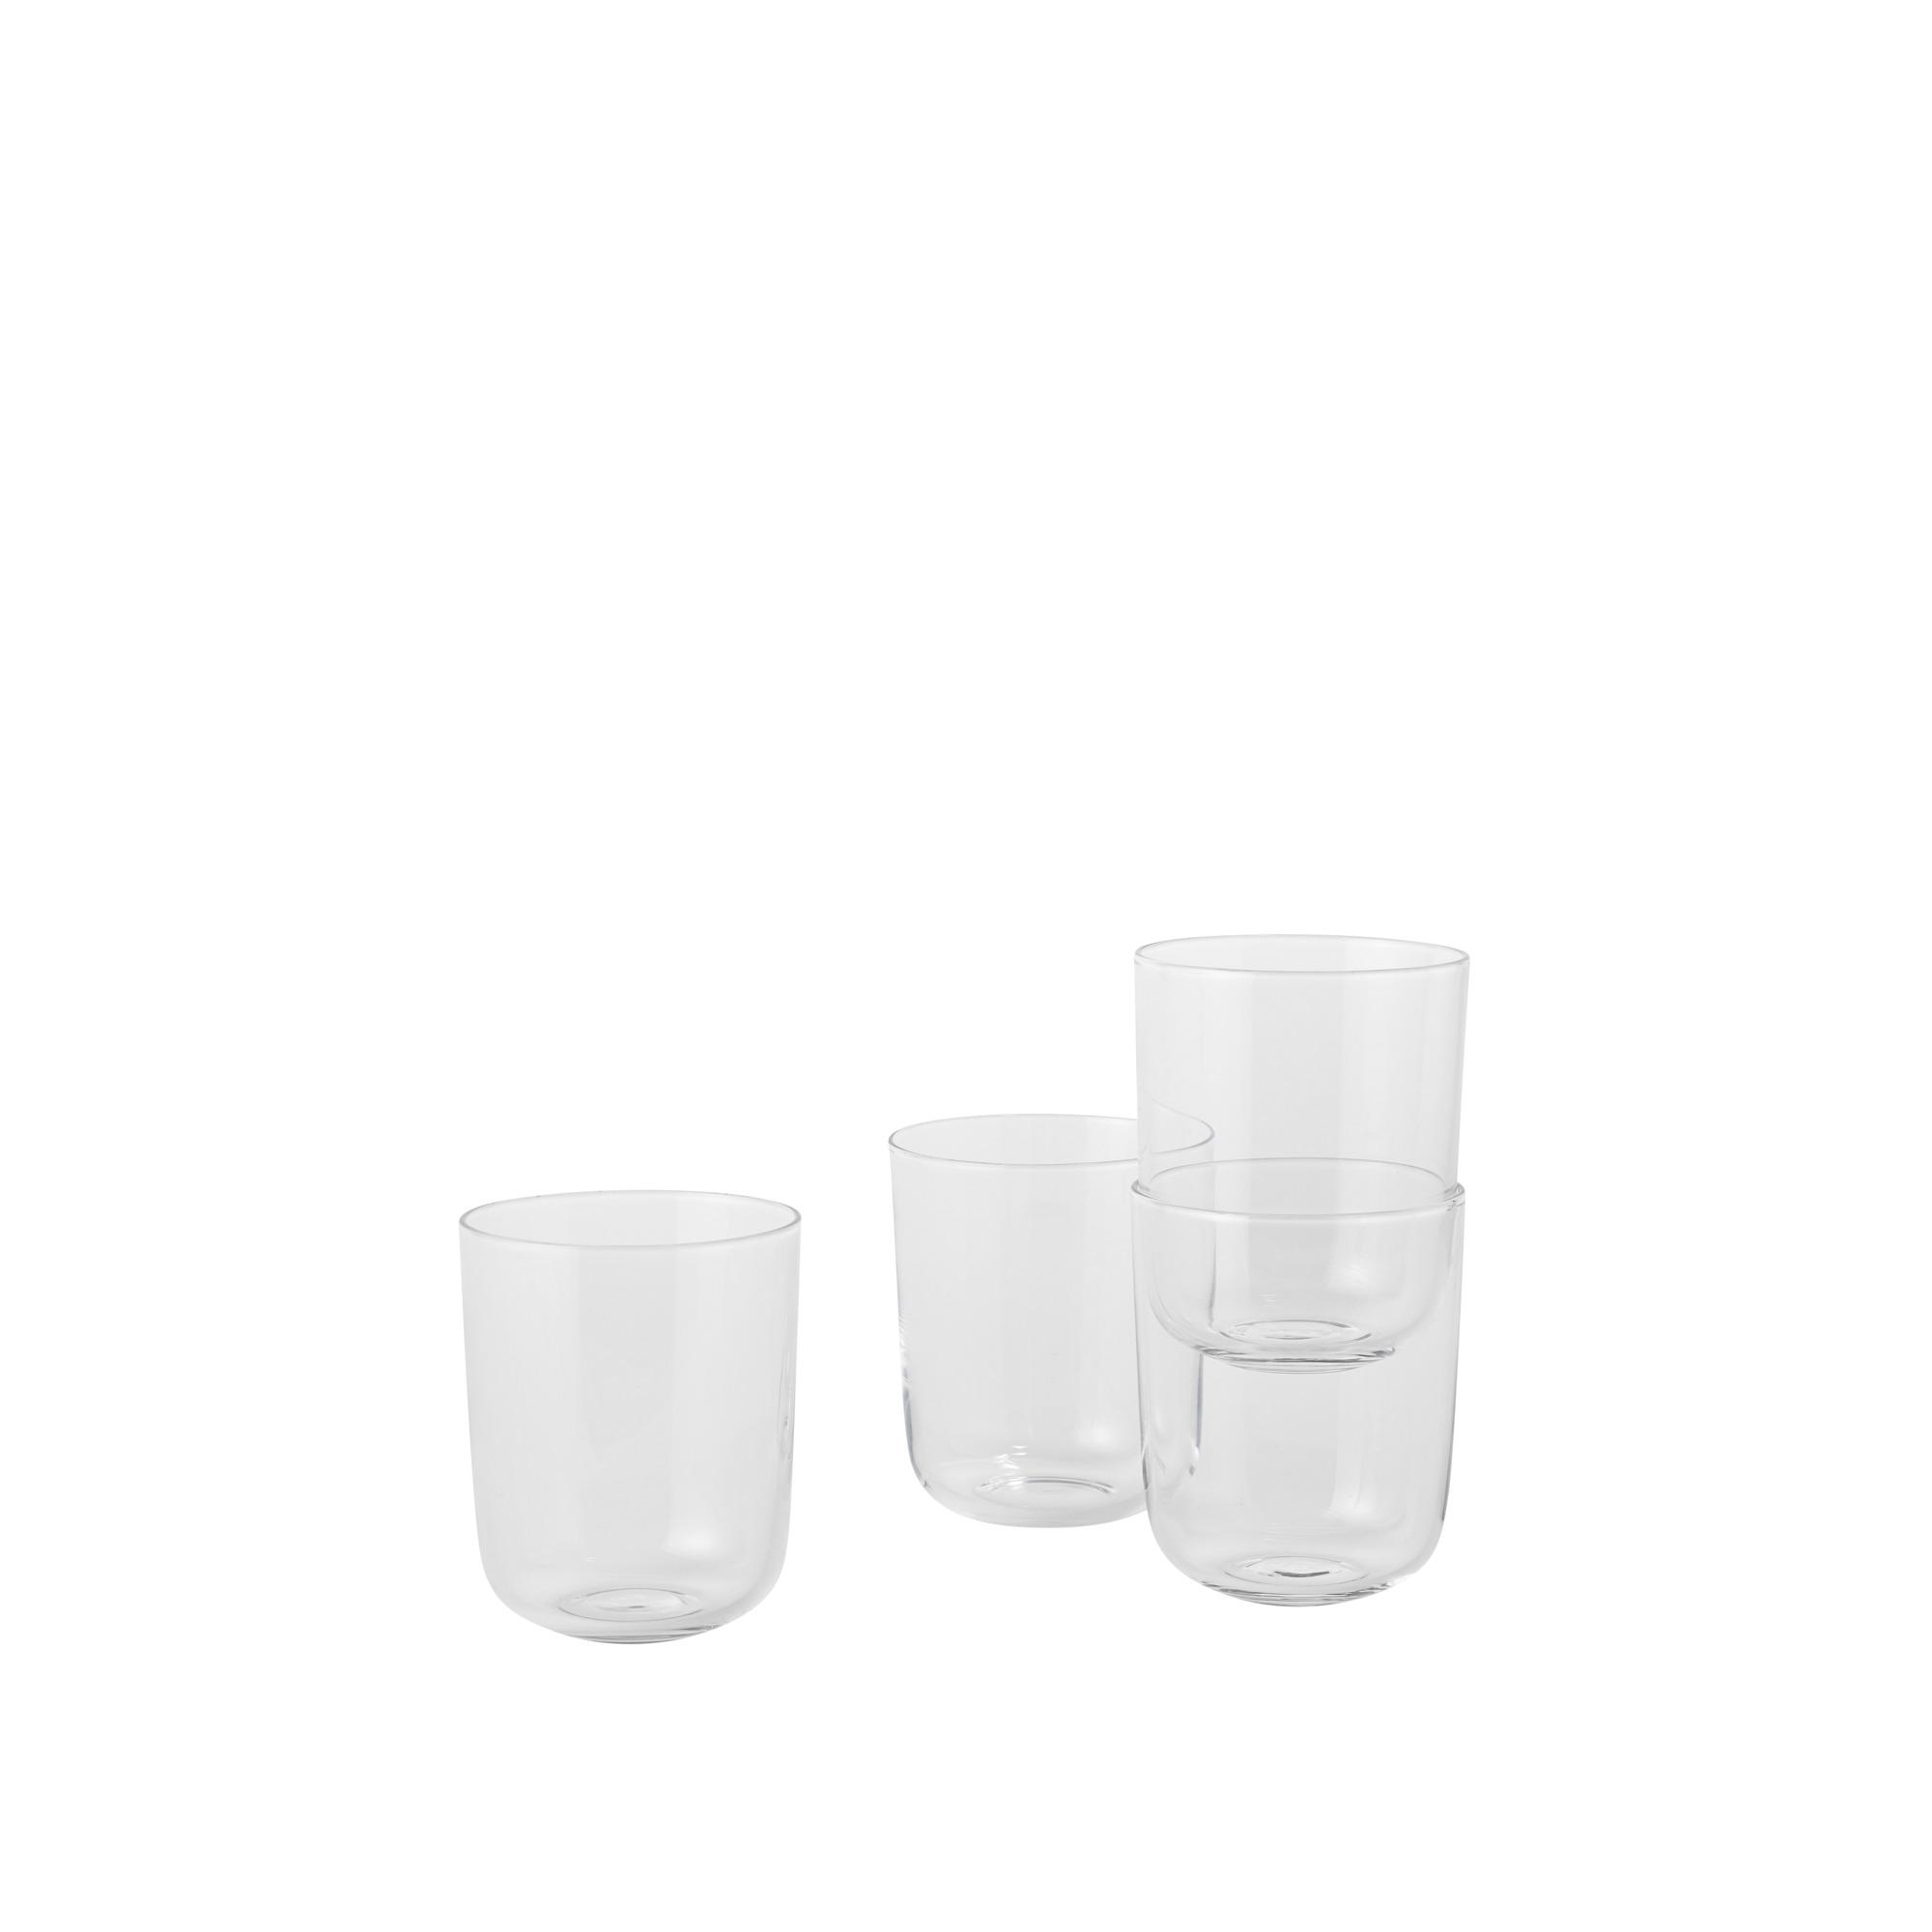 Corky Glasses Glas Tall Klar Muuto